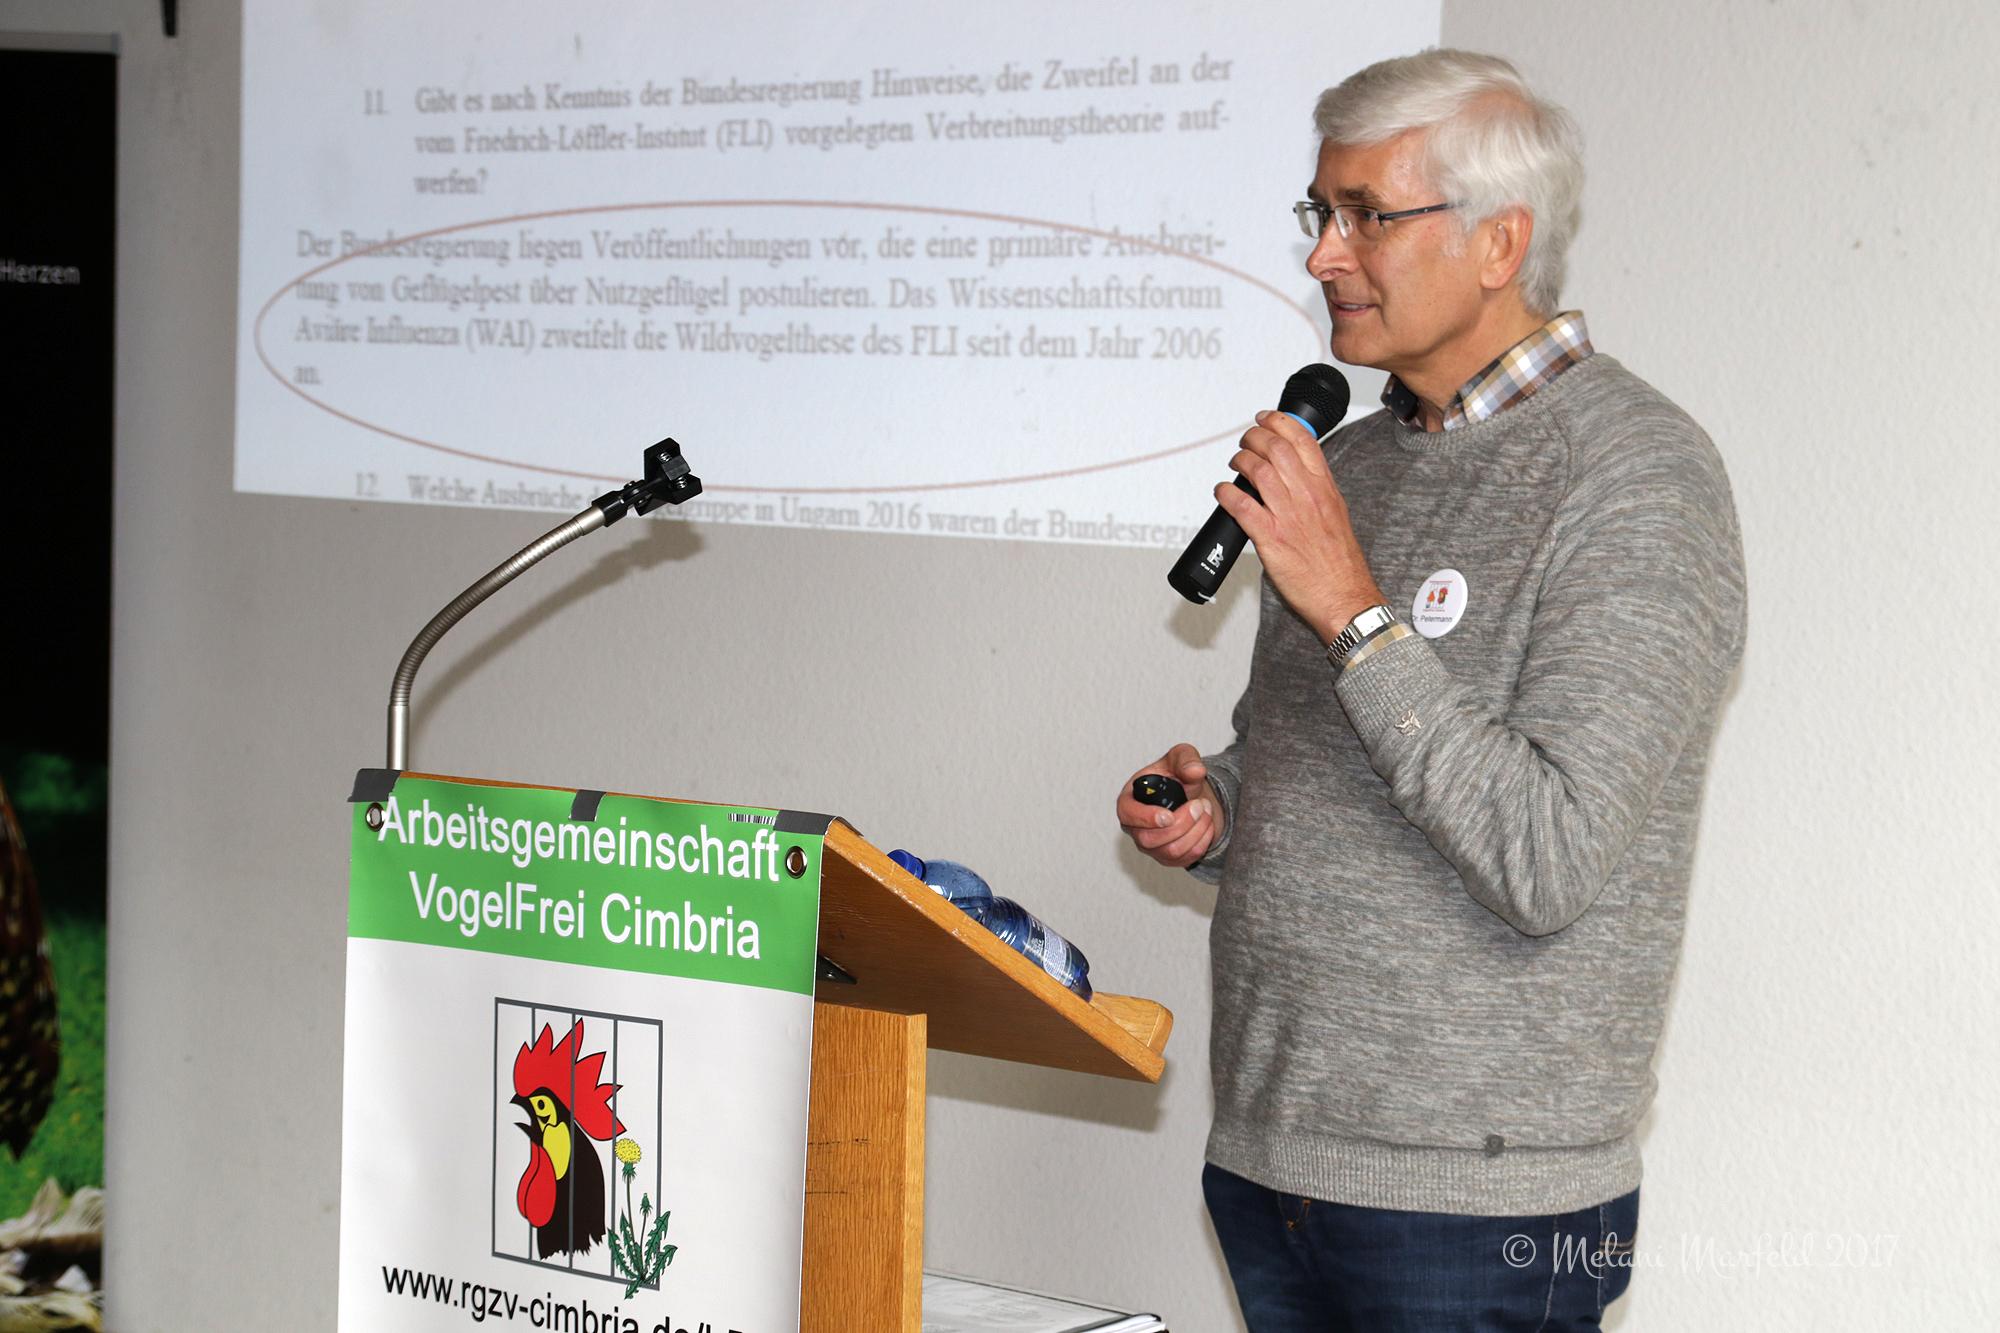 Dr. Peter Petermann